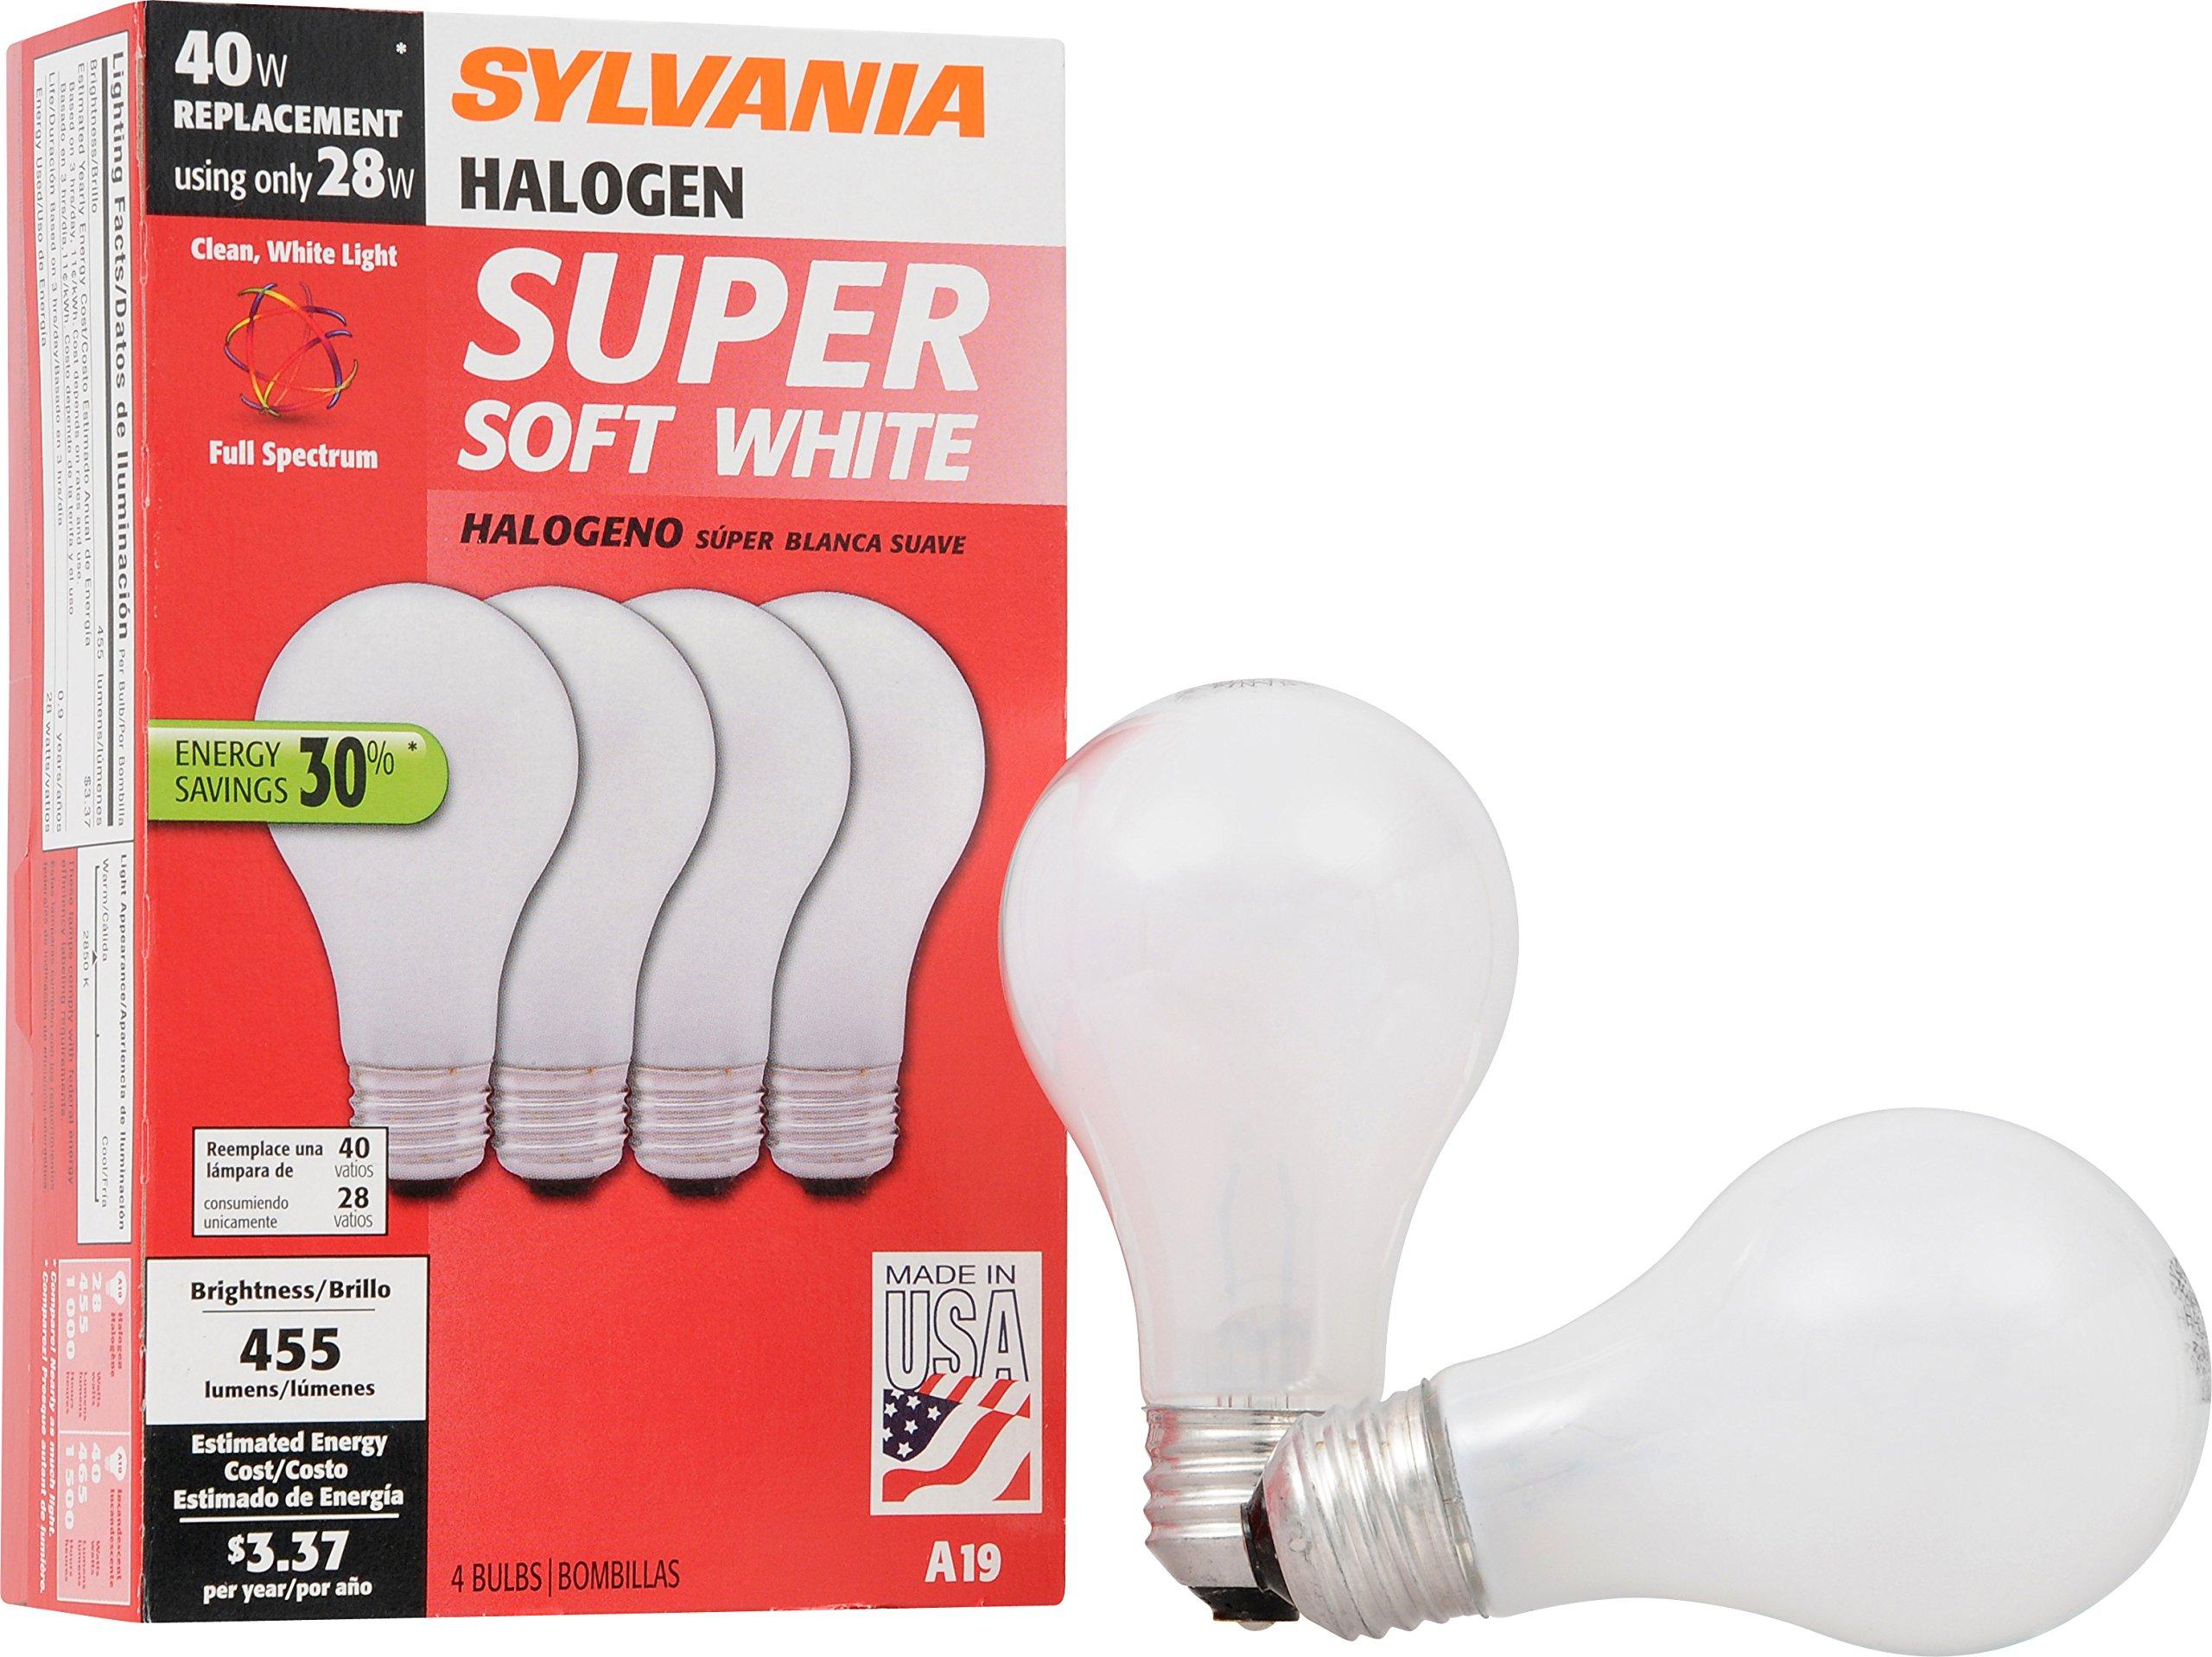 Sylvania Home Lighting 52190 Tungsten Halogen Bulb, A19-40W-2700K, Soft White Finish, Medium Base, Pack of 4